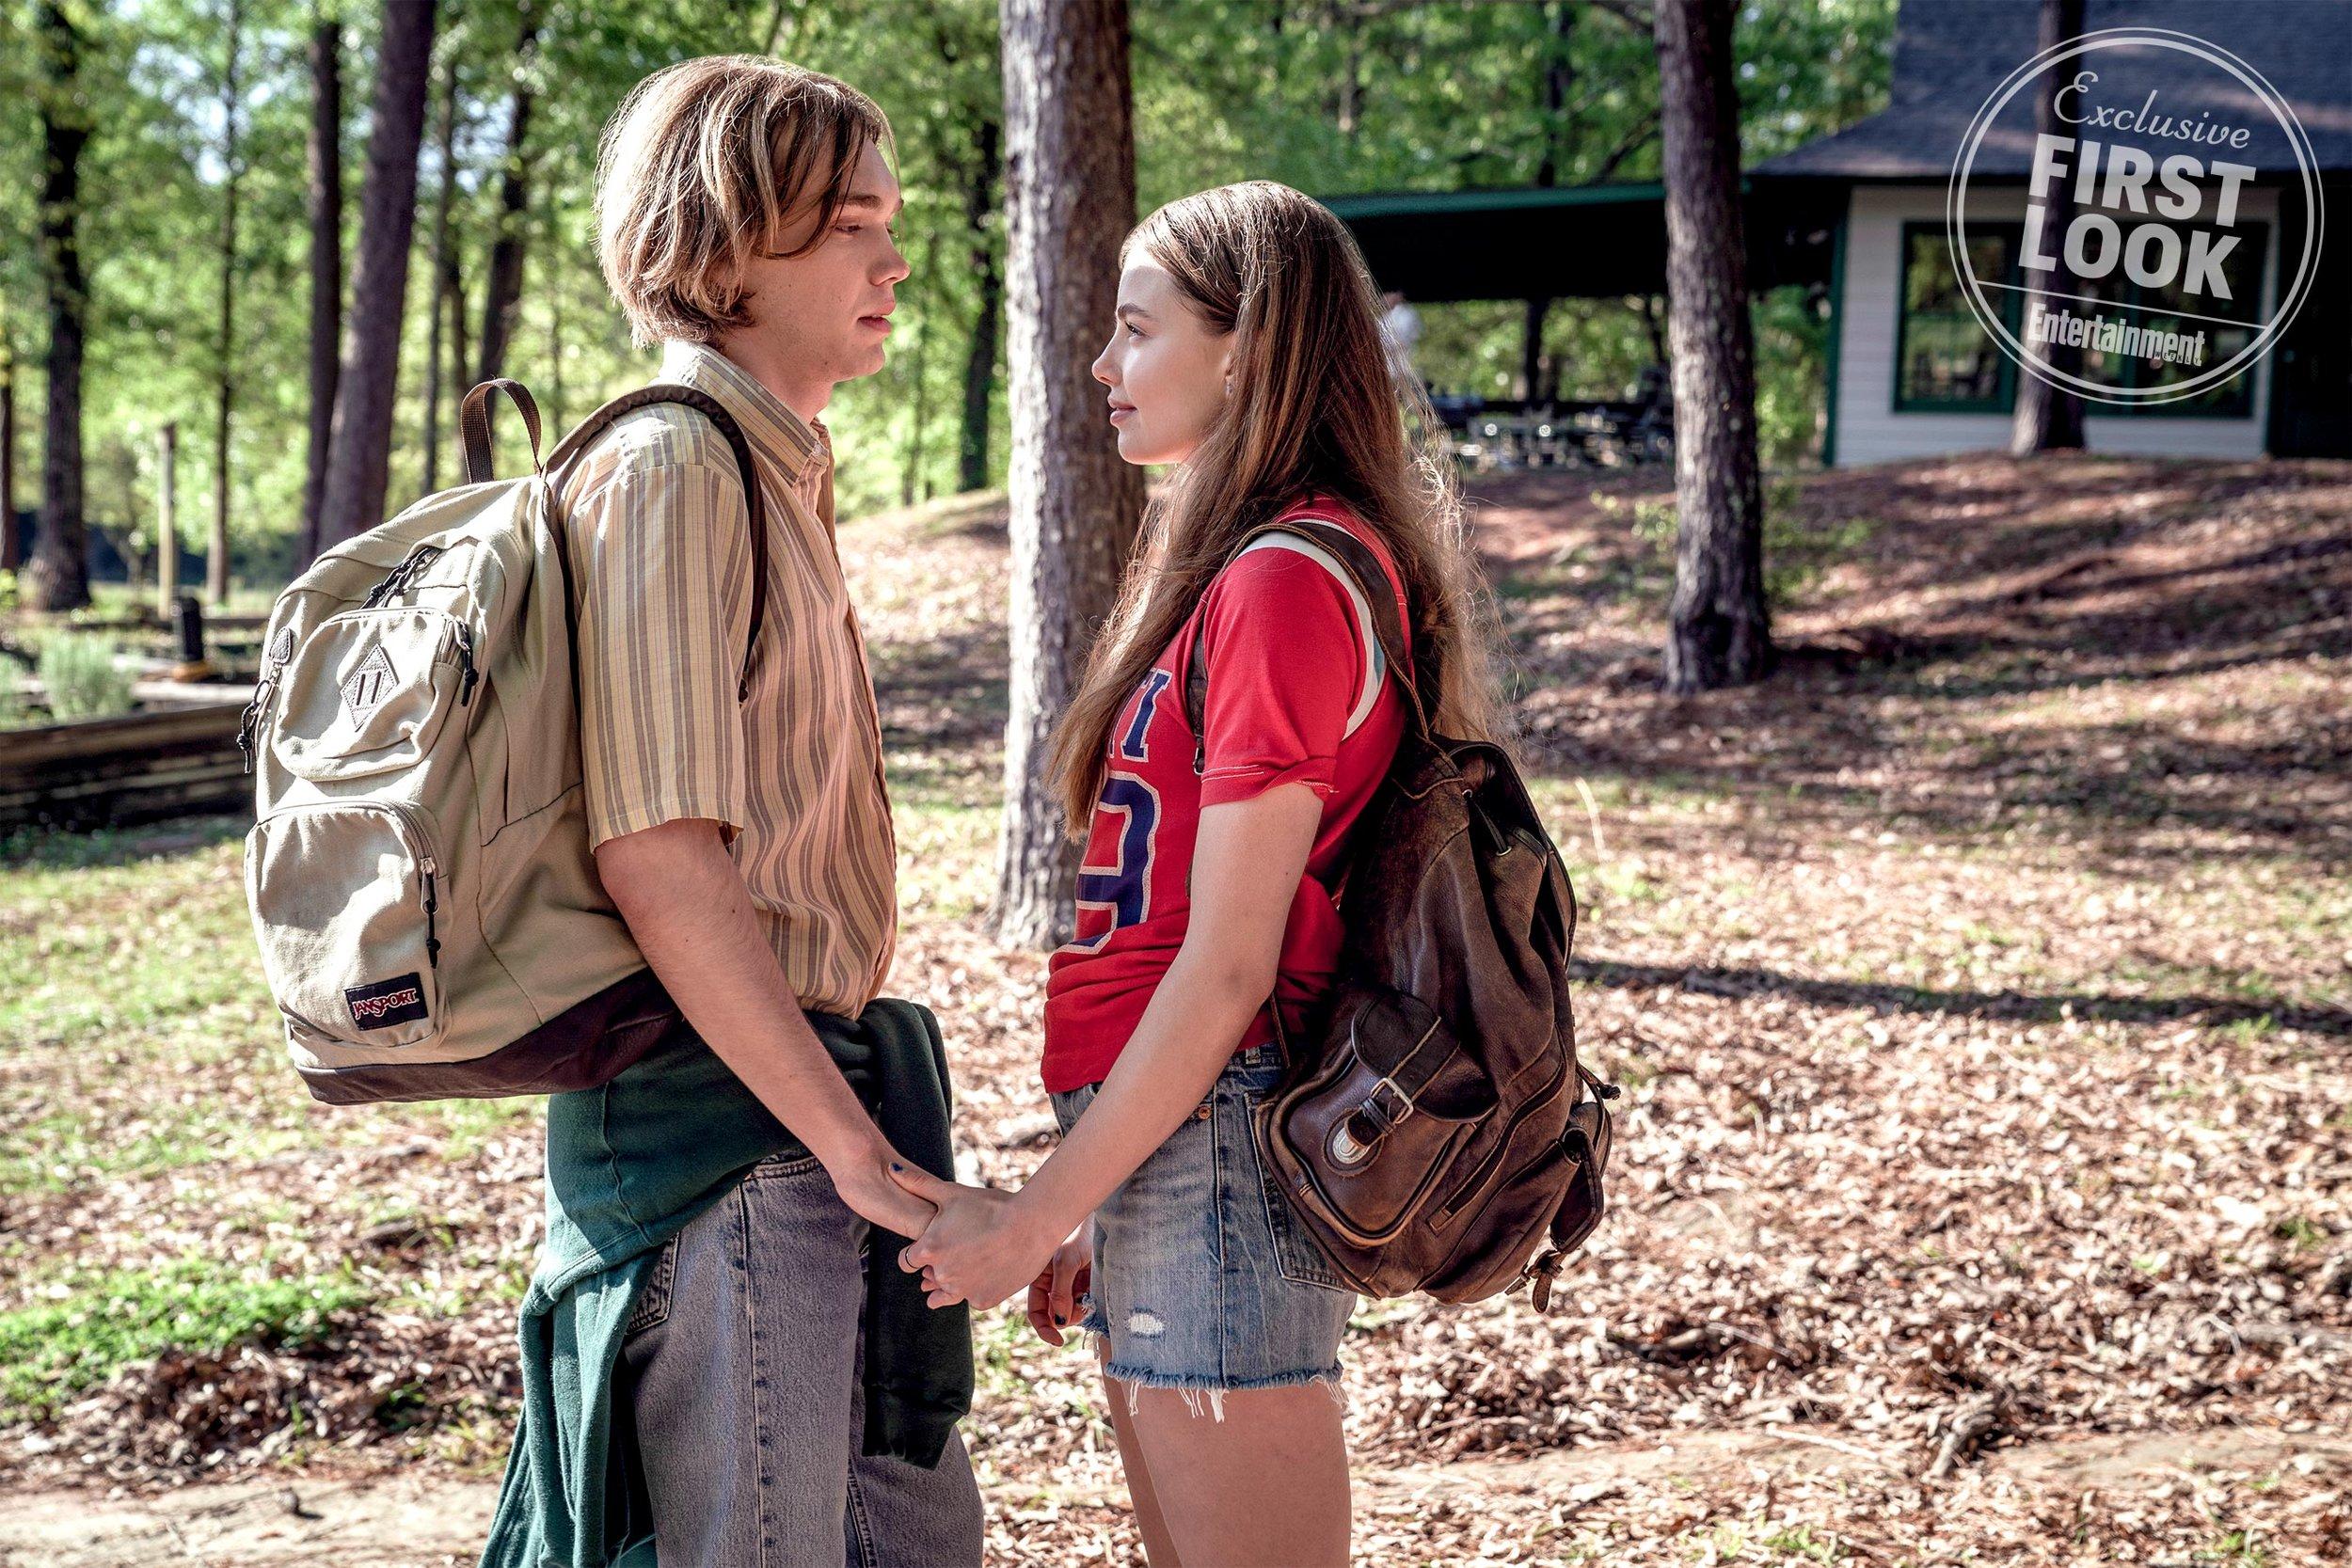 Charlie Plummer as Miles, Kristine Froseth as Alaska.  Alfonso Bresciani/HULU